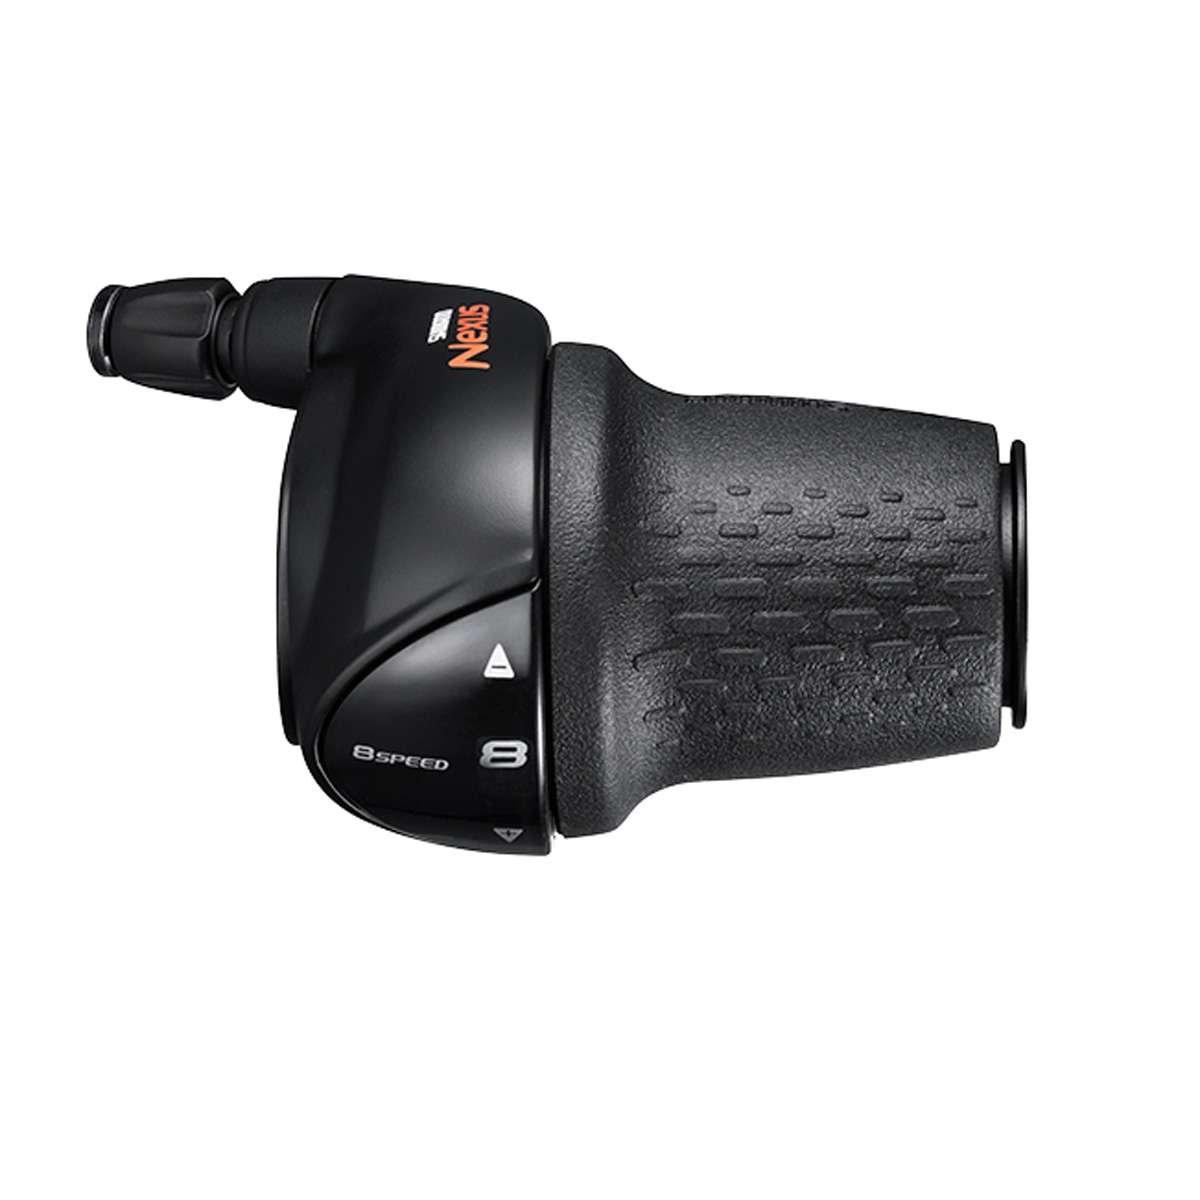 ESLC60008L210LA SL-C6000-8 Shimano Nexus Pavement Bicycle Shift Lever